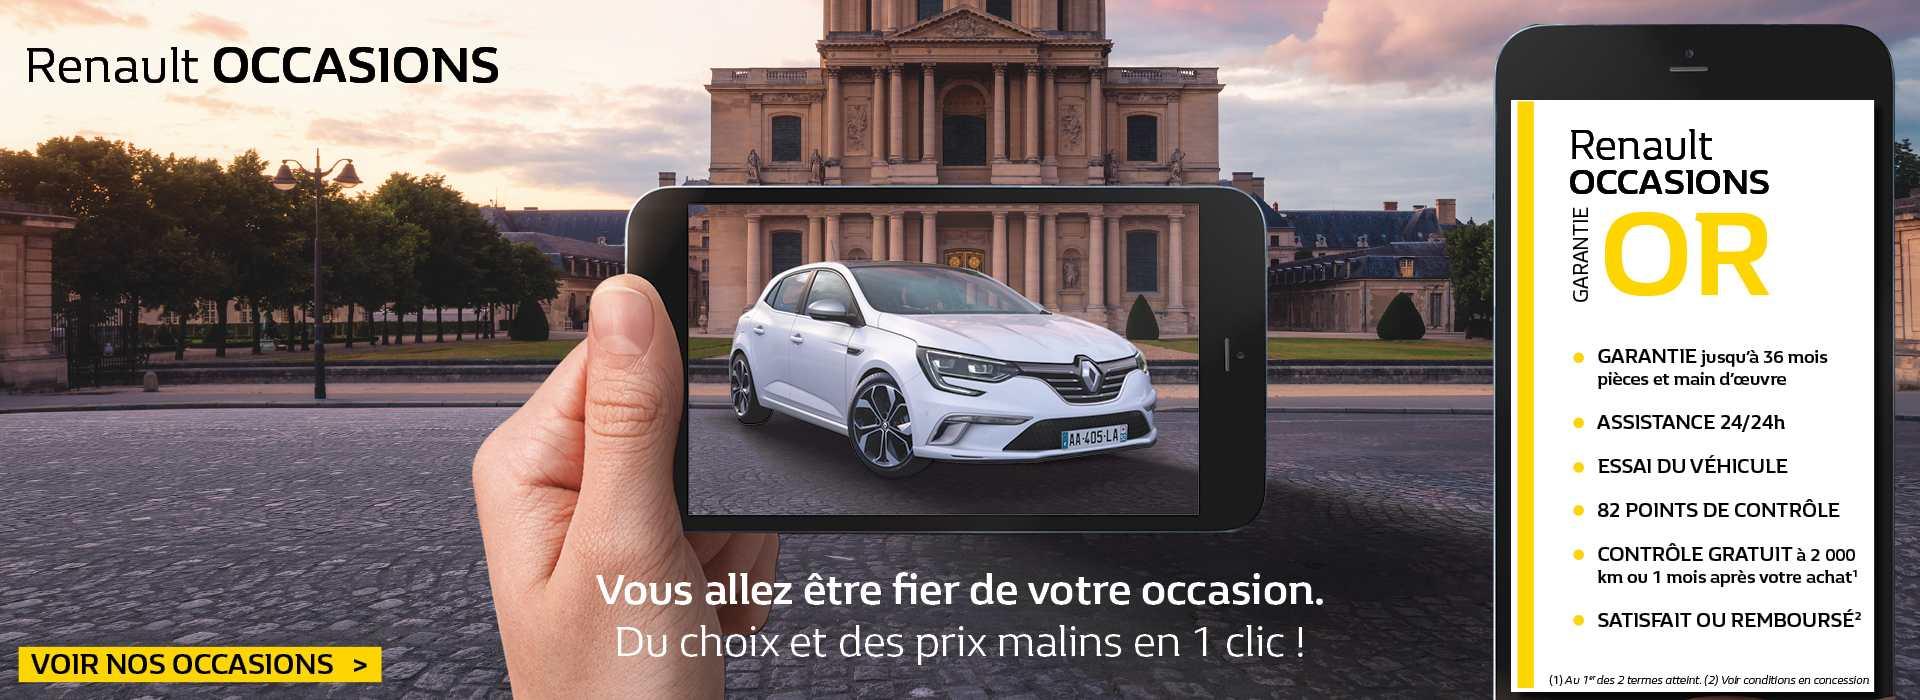 Renault annemasse concessionnaire garage haute savoie 74 for Garage renault haute goulaine